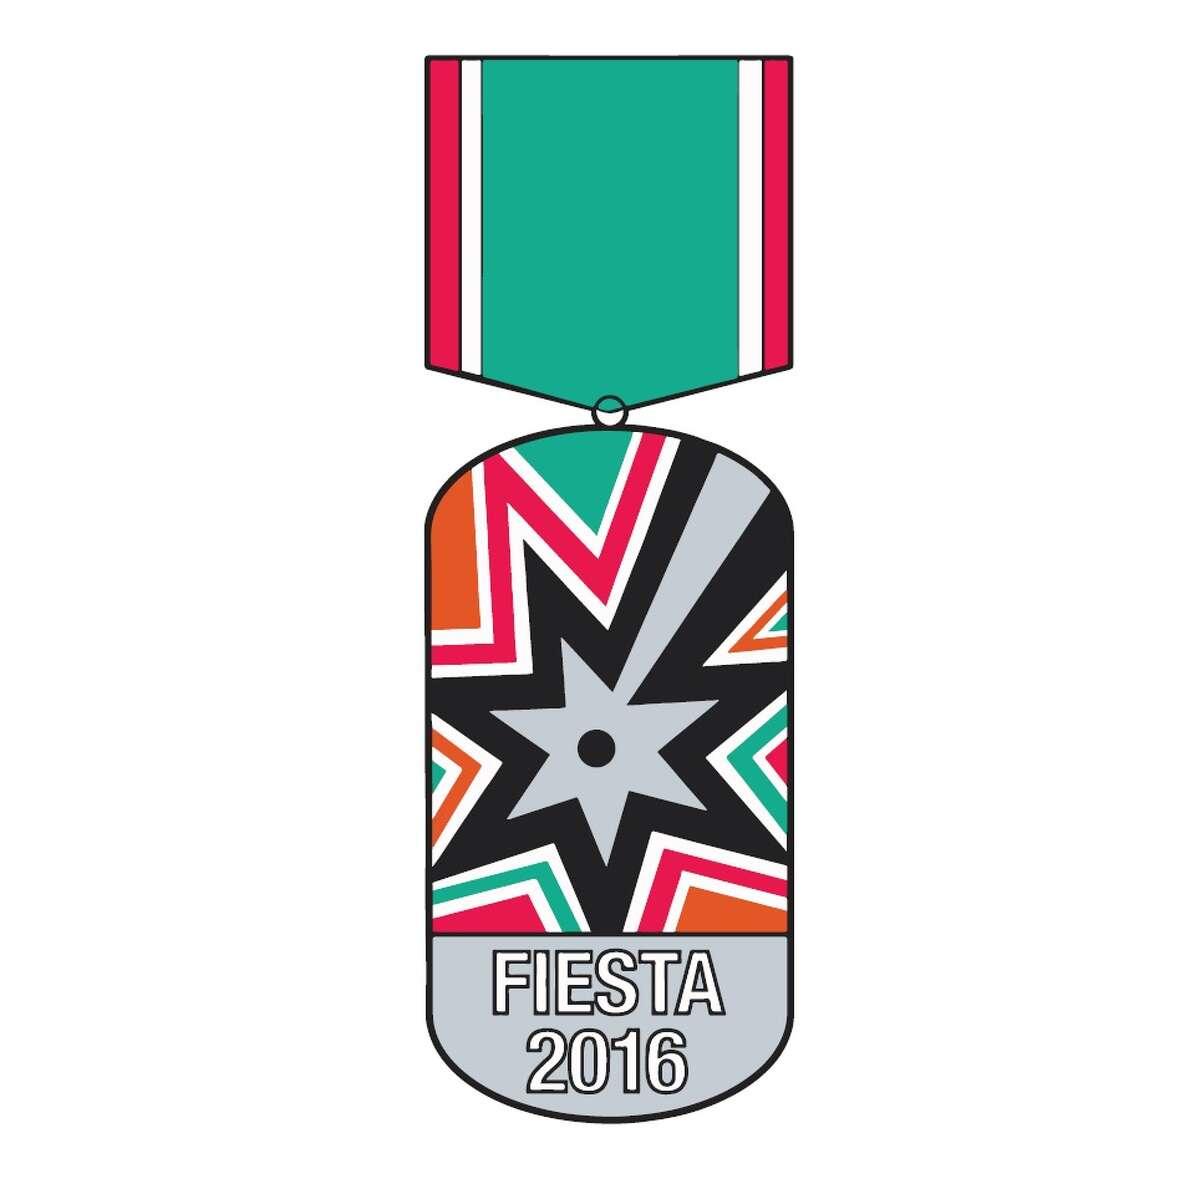 San Antonio Spurs Fiesta Medal design for 2016, by Ryan Cano